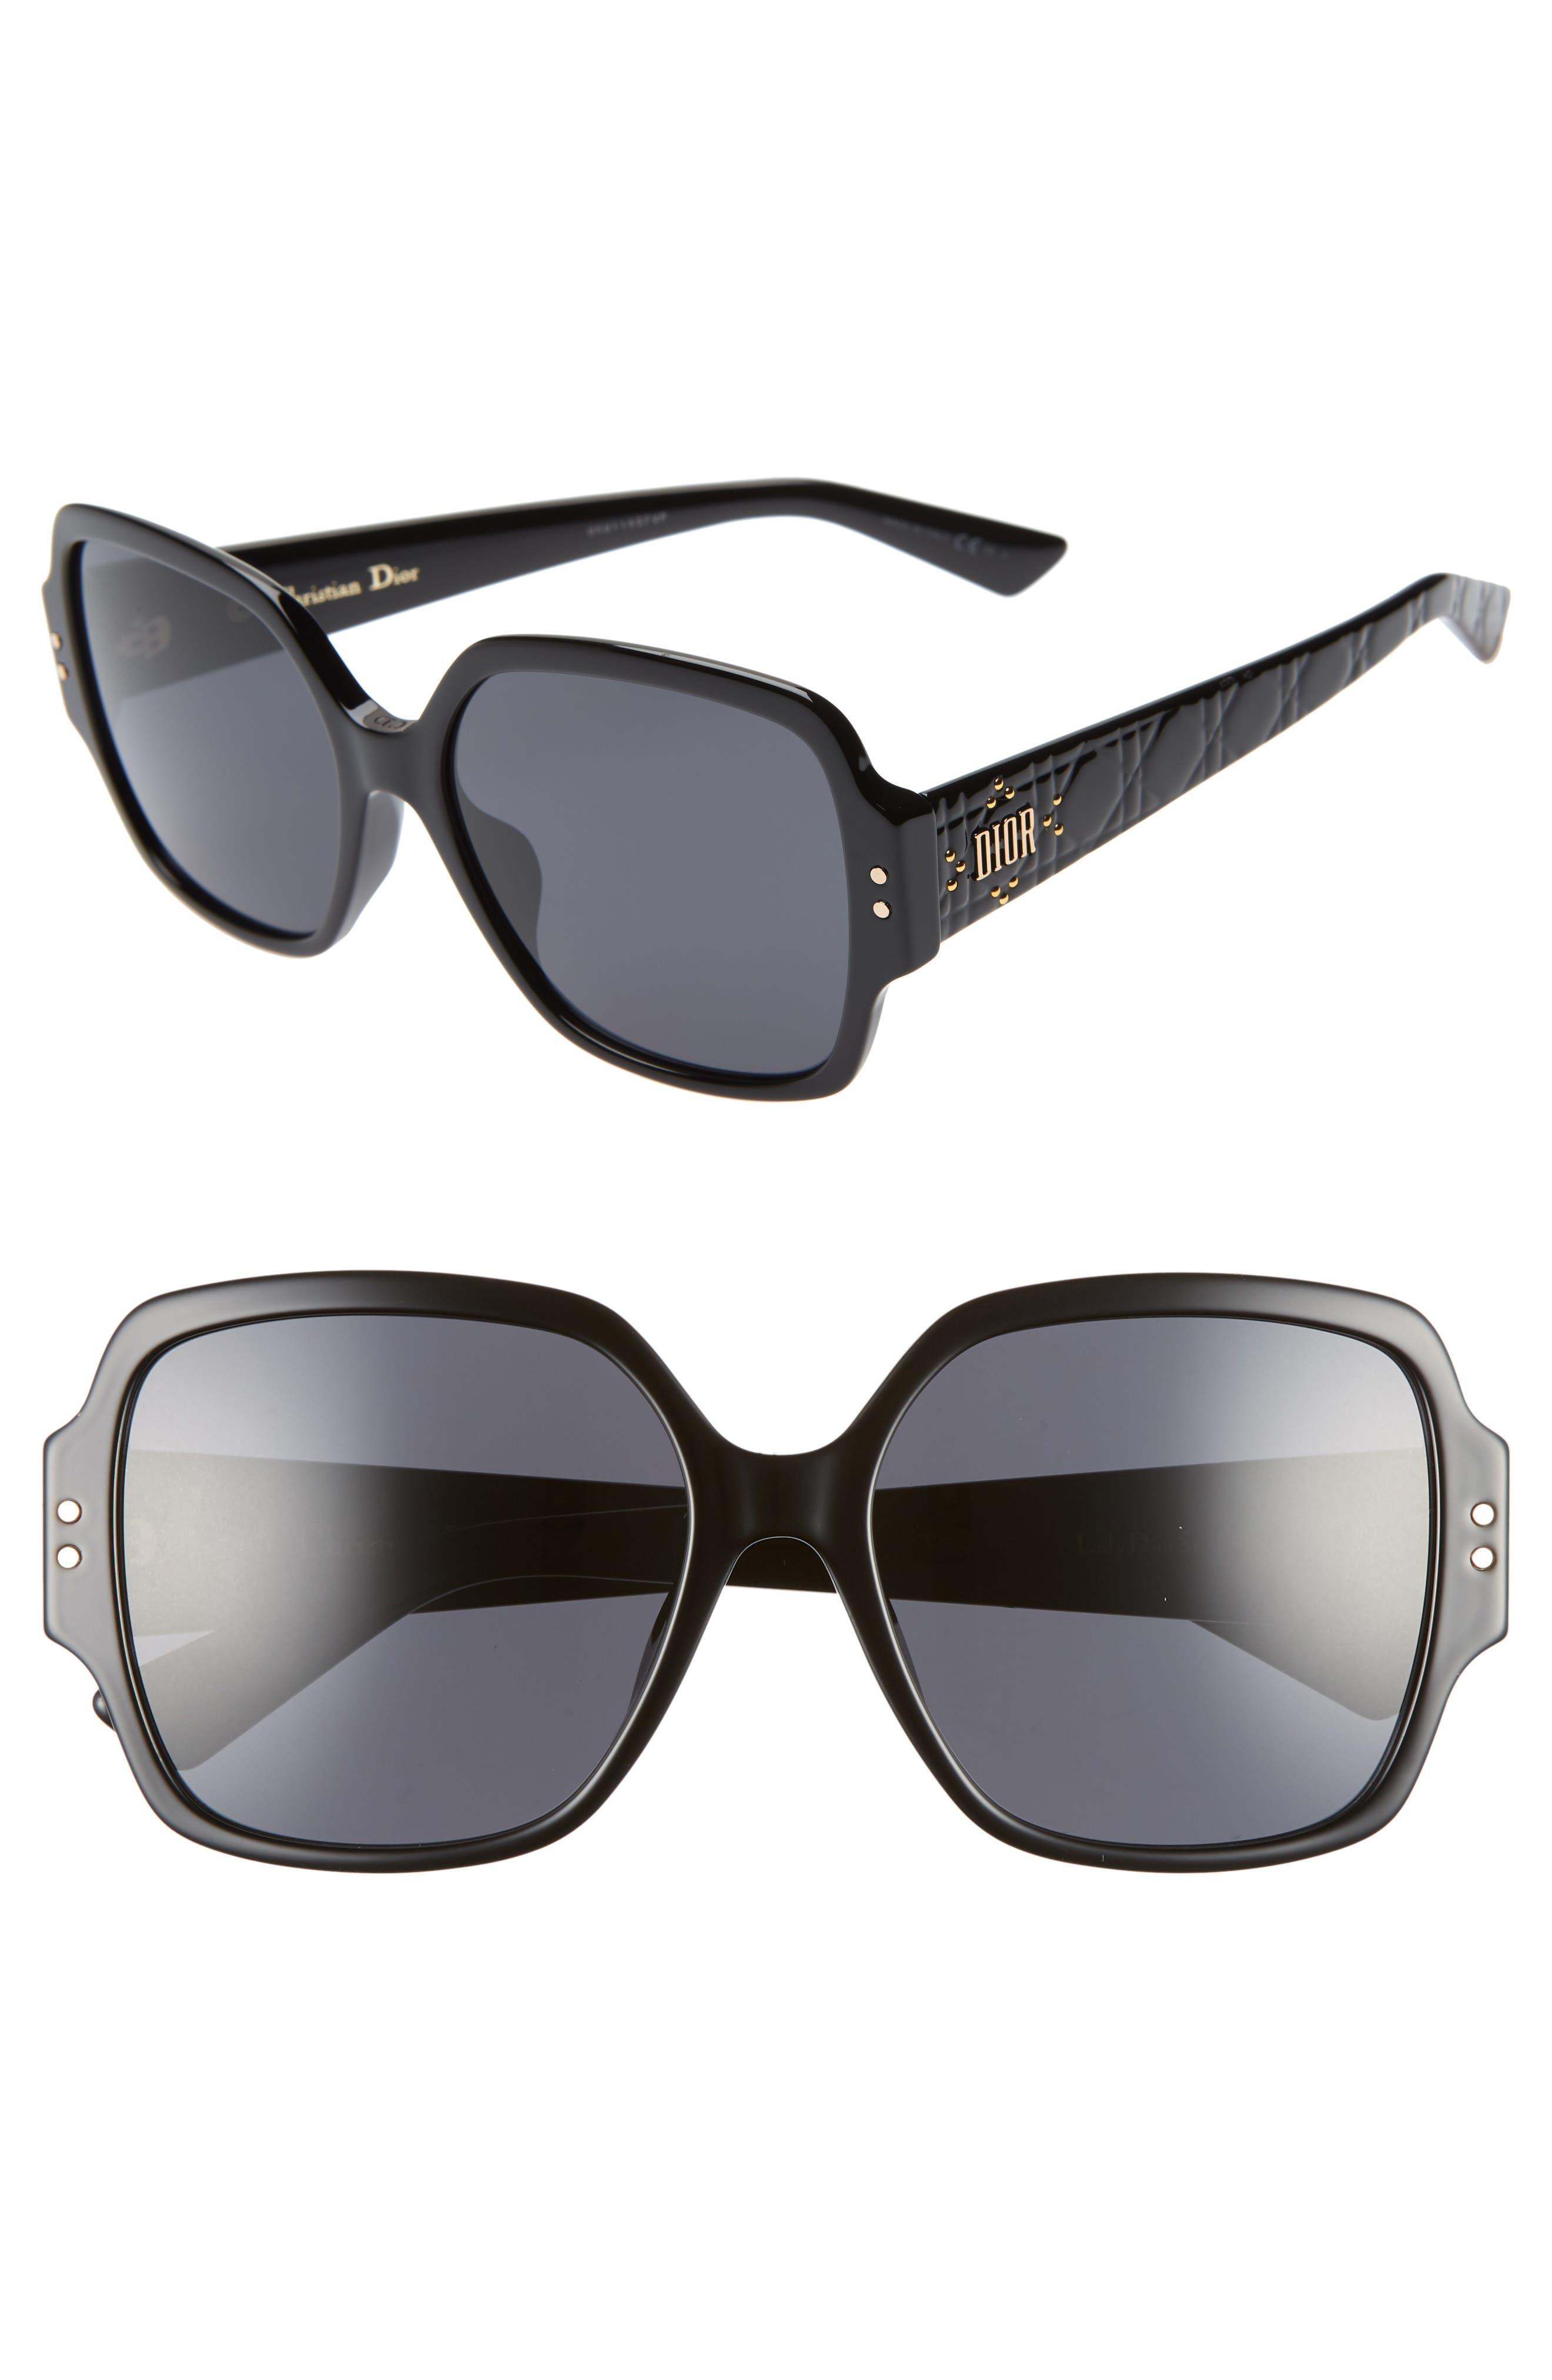 07a6694da69a Dior lady dior stud special fit square sunglasses jpg 480x730 Glasses  collection 2012 dior